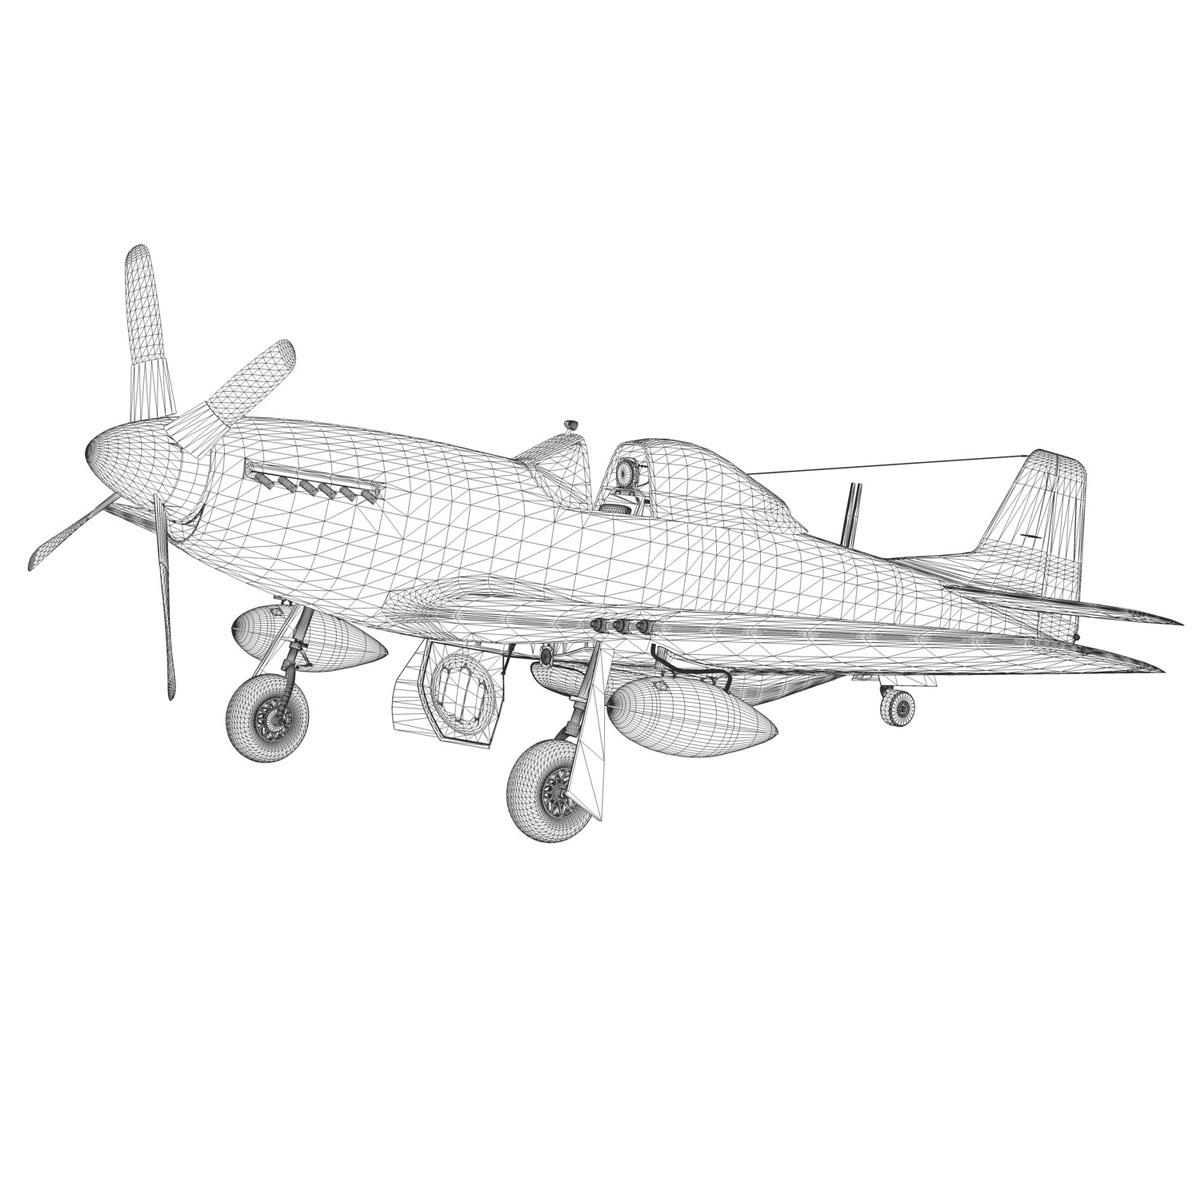 North American P-51D - Geraldine 3d model fbx c4d lwo obj 265955